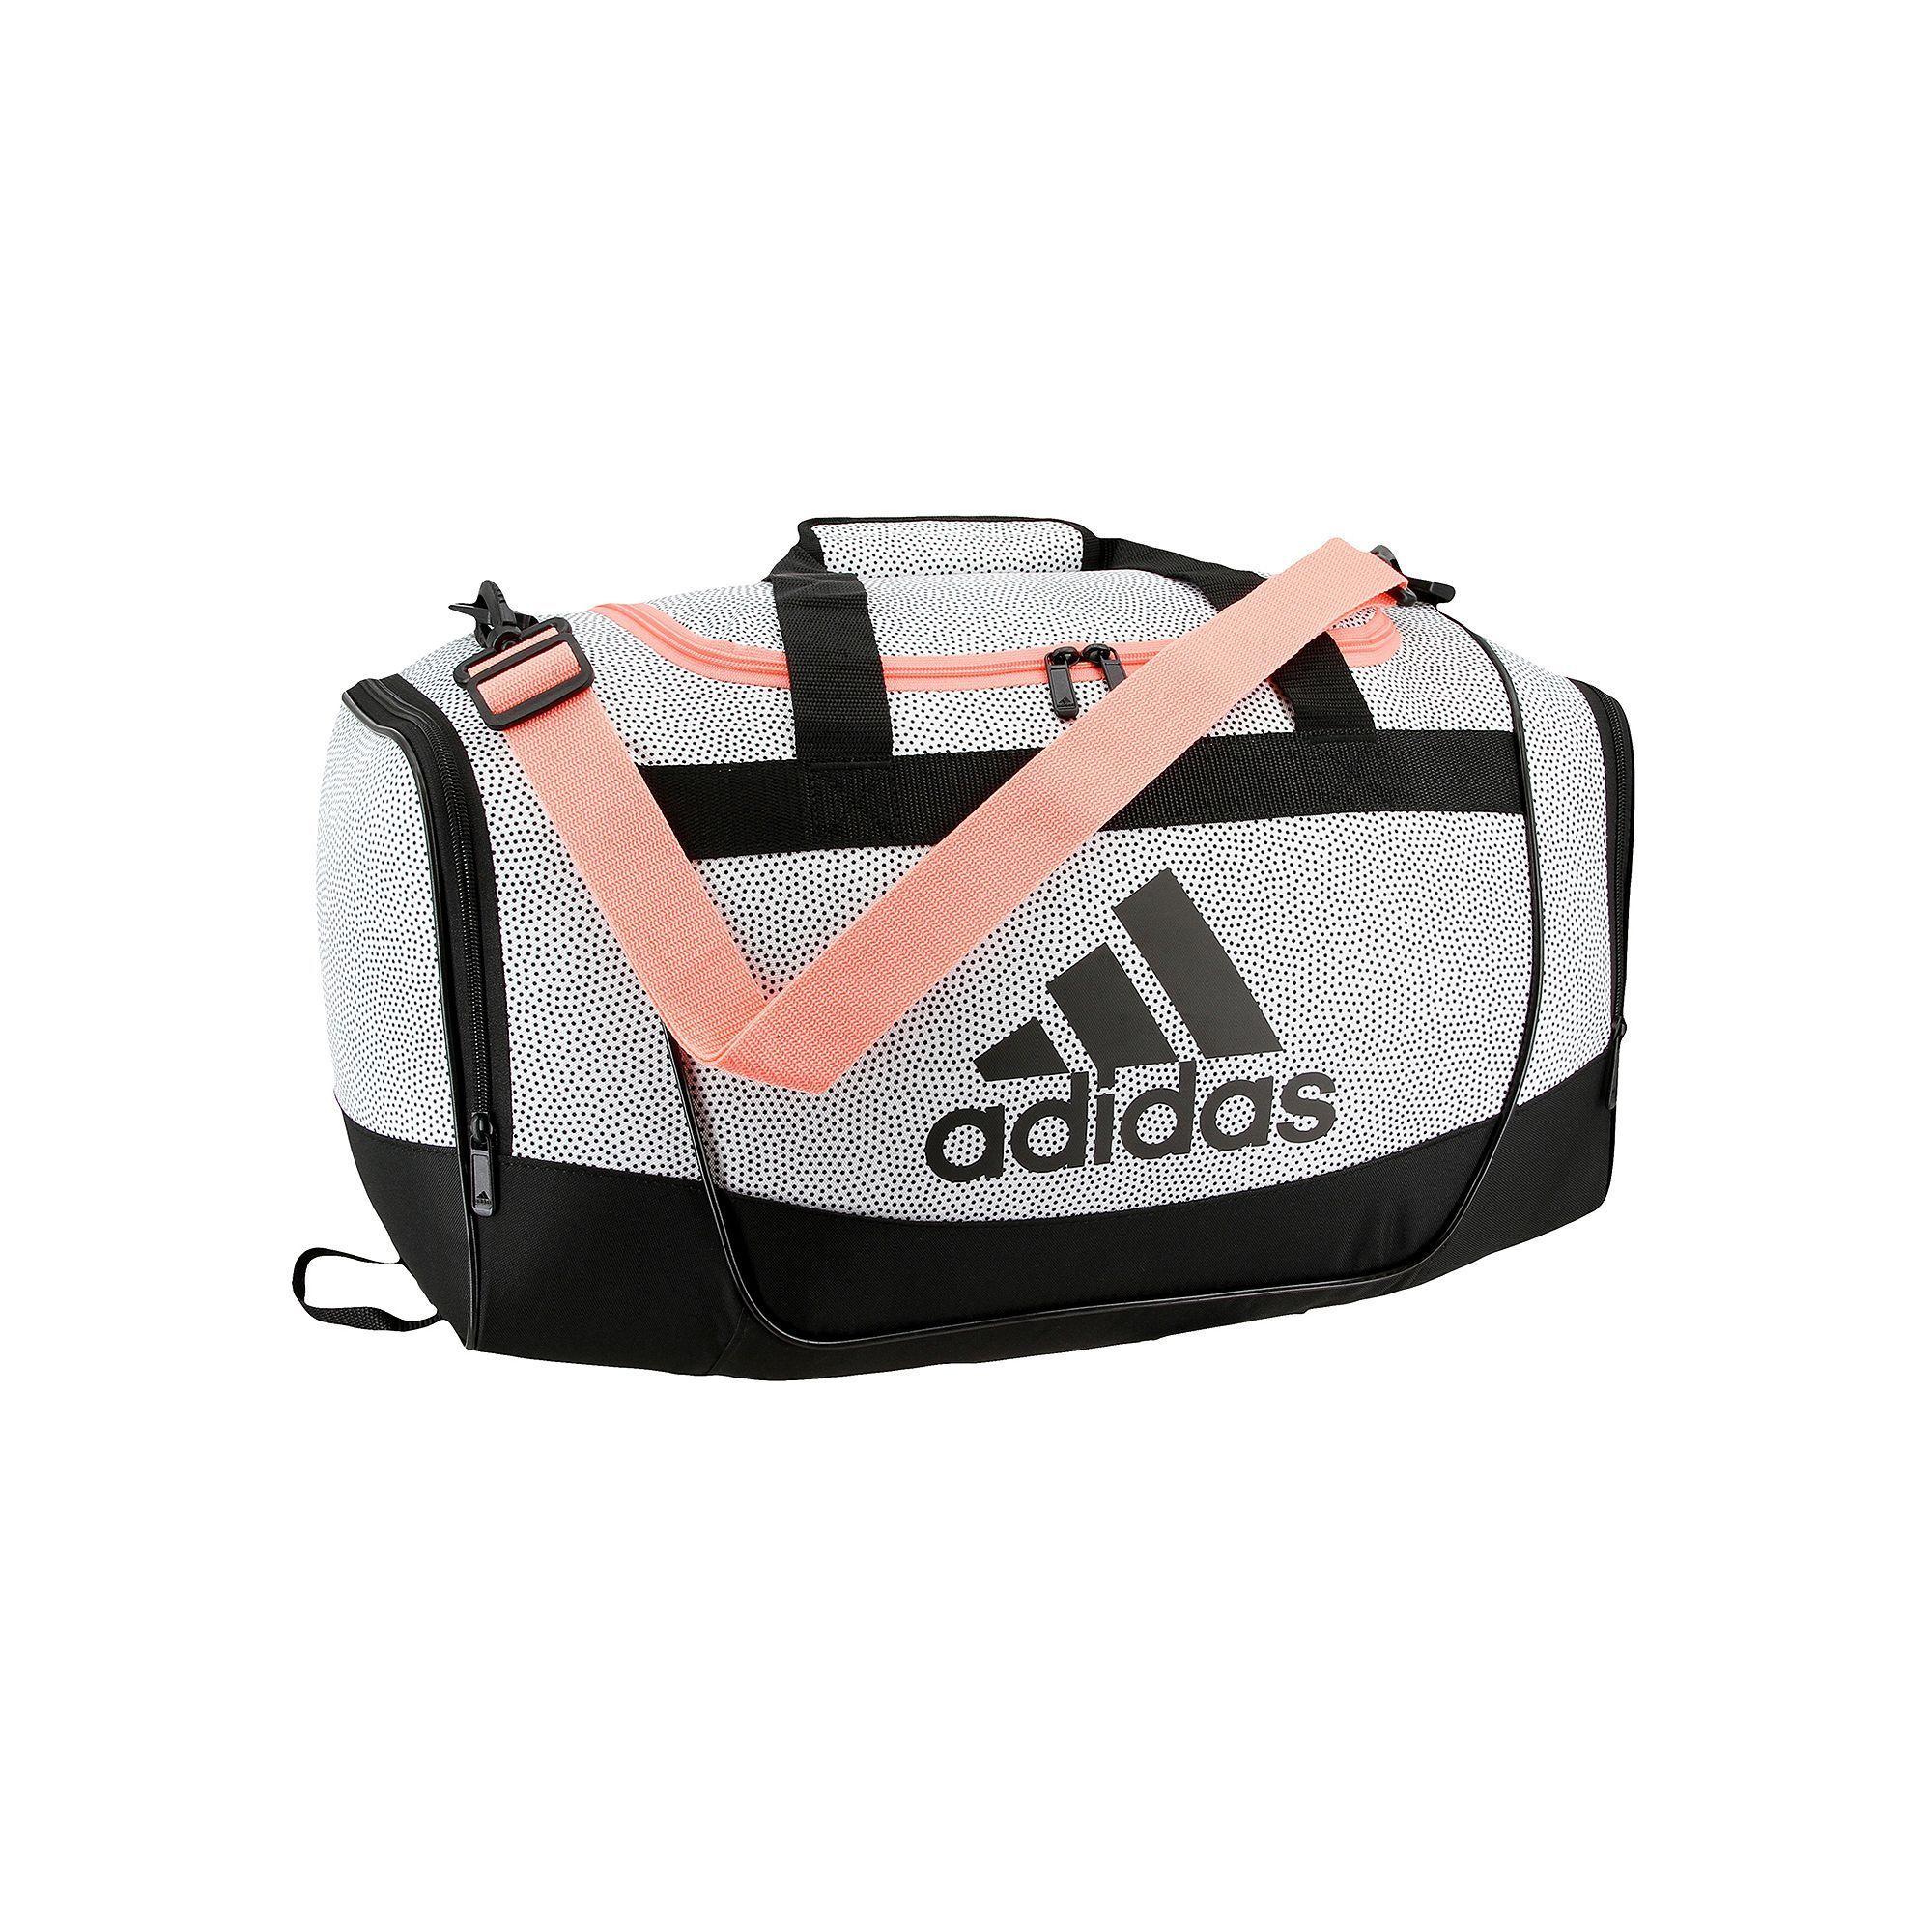 Adidas Defender Ii Small Duffel Bag Adidas Duffle Bag Bags